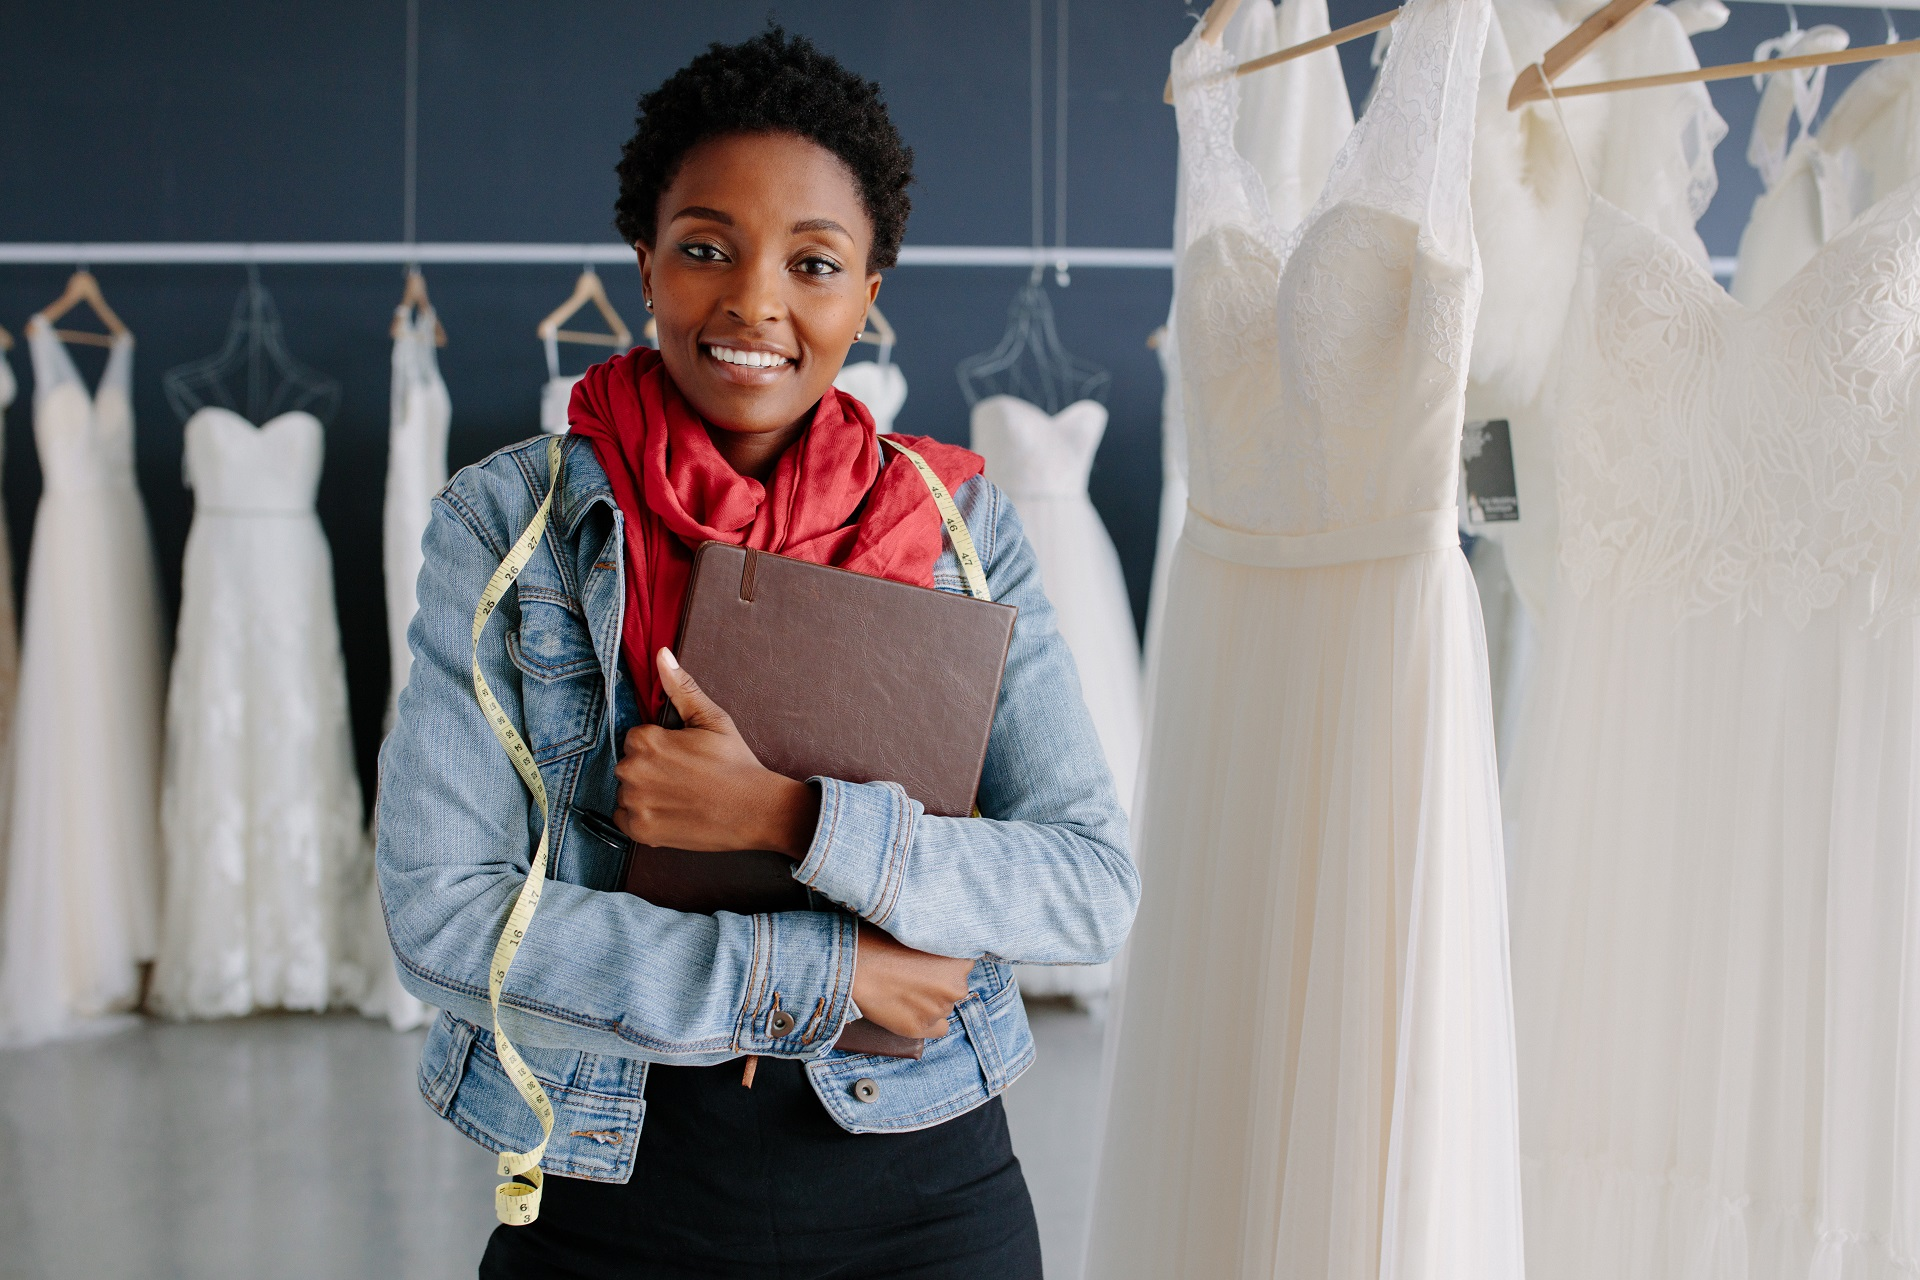 Wedding Careers, Internships & Business Opportunities